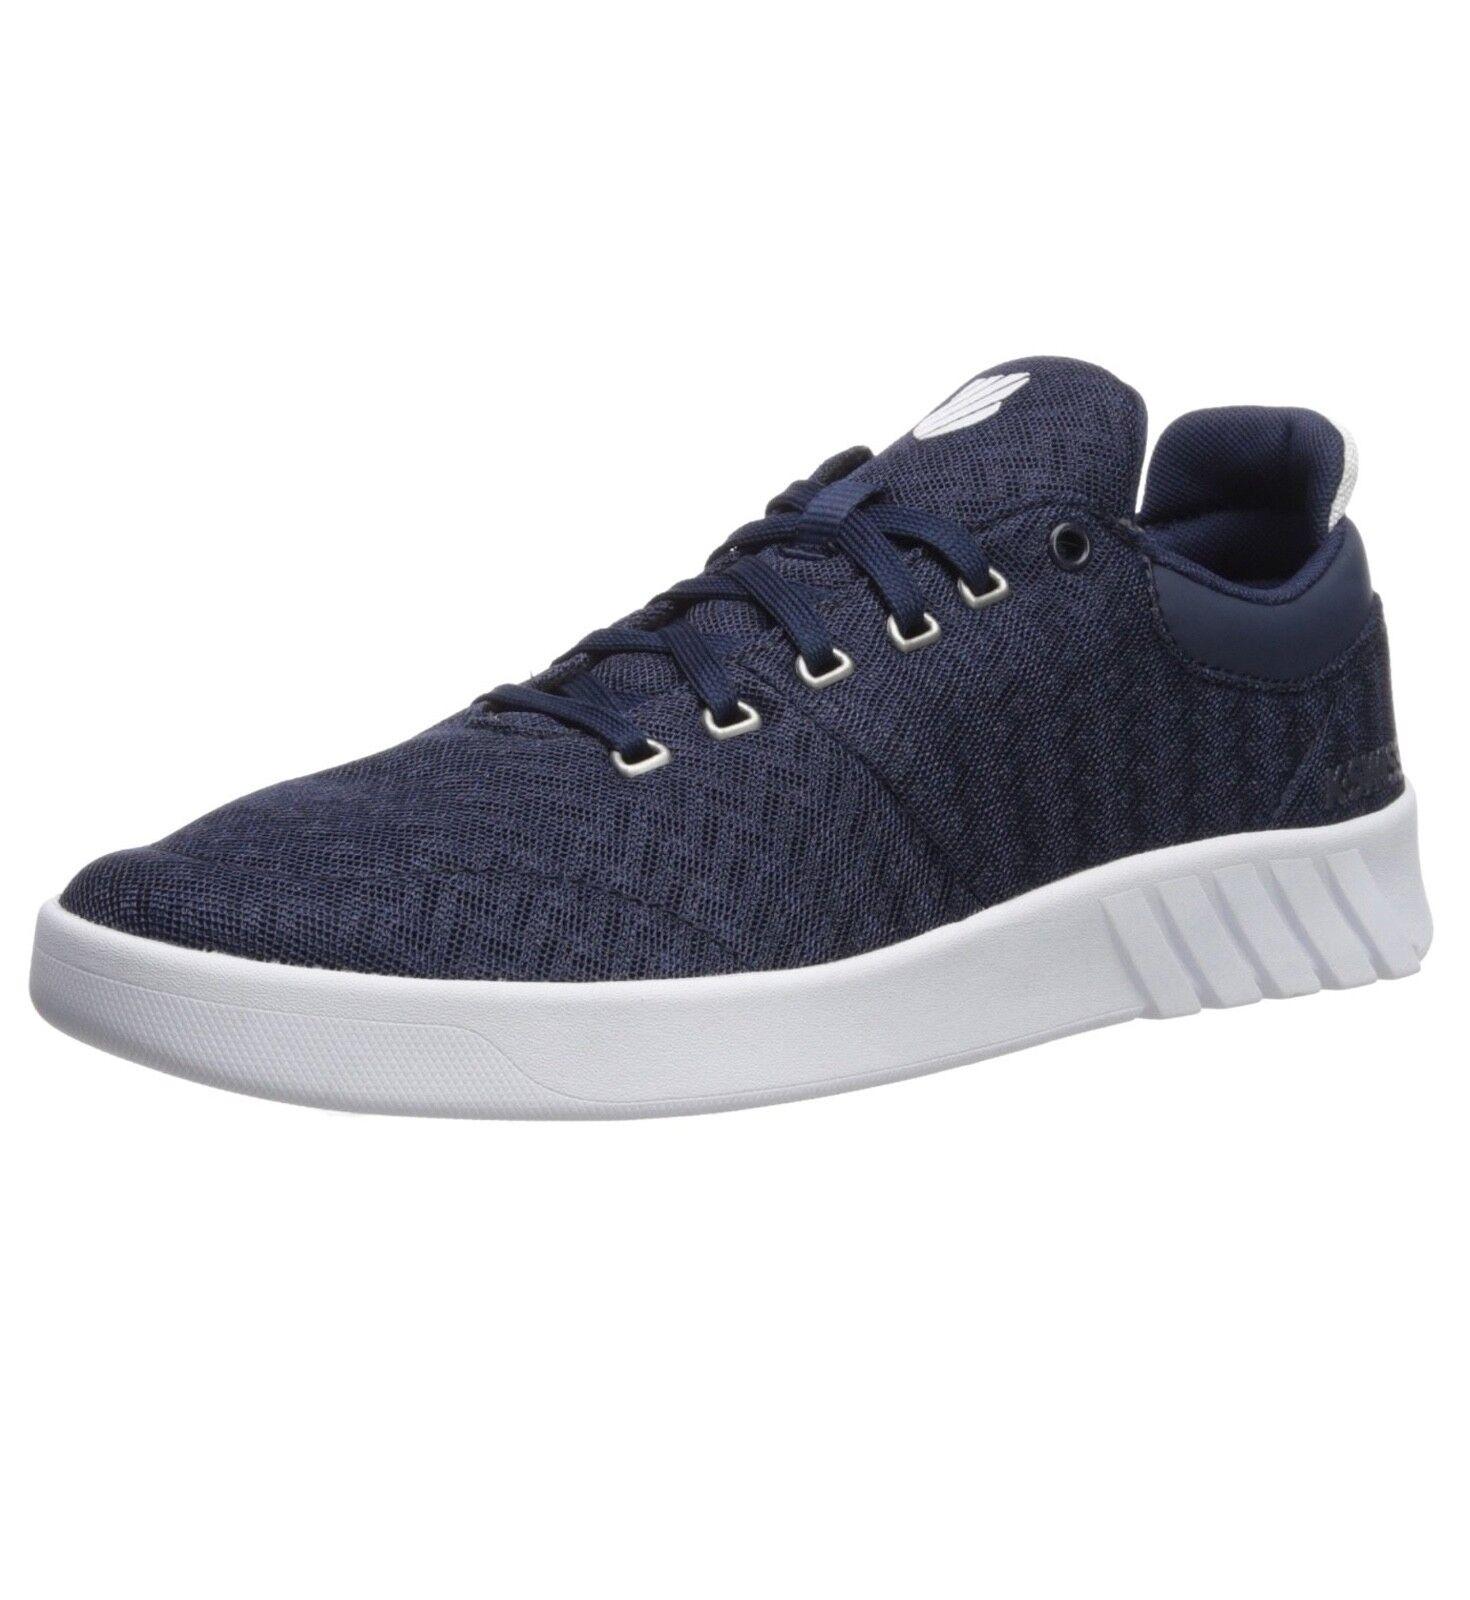 K-Swiss Aero Lightweight Trainer Casual Sporty Gym Mesh Sneaker Shoe Iris Blue